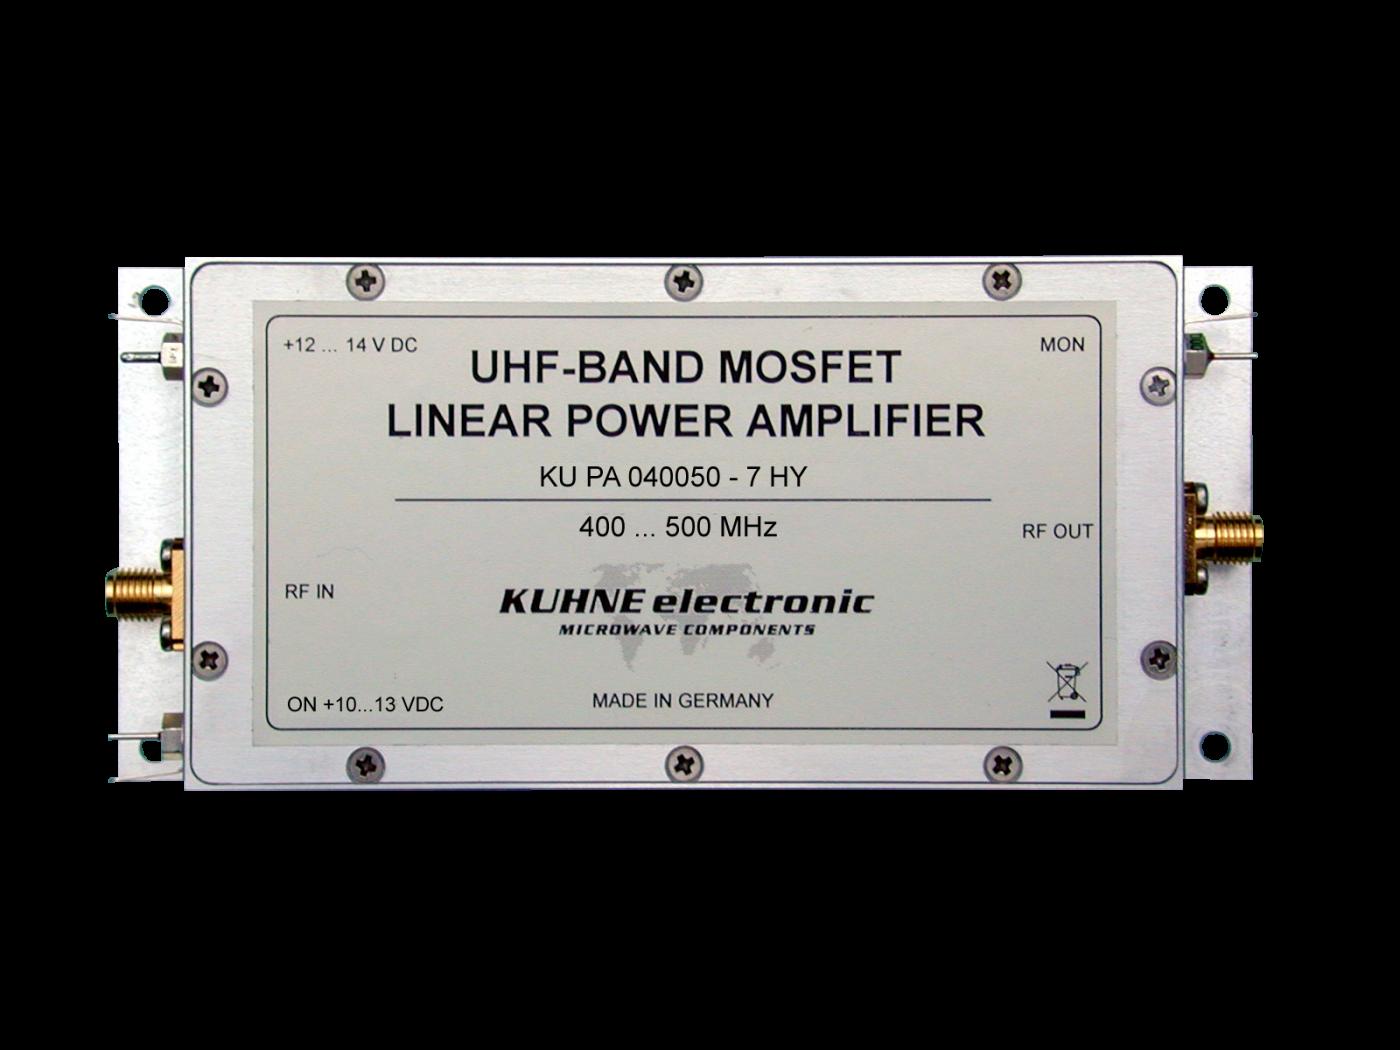 KU PA 040050-7 HY, MOSFET Power Amplifier - Webseite